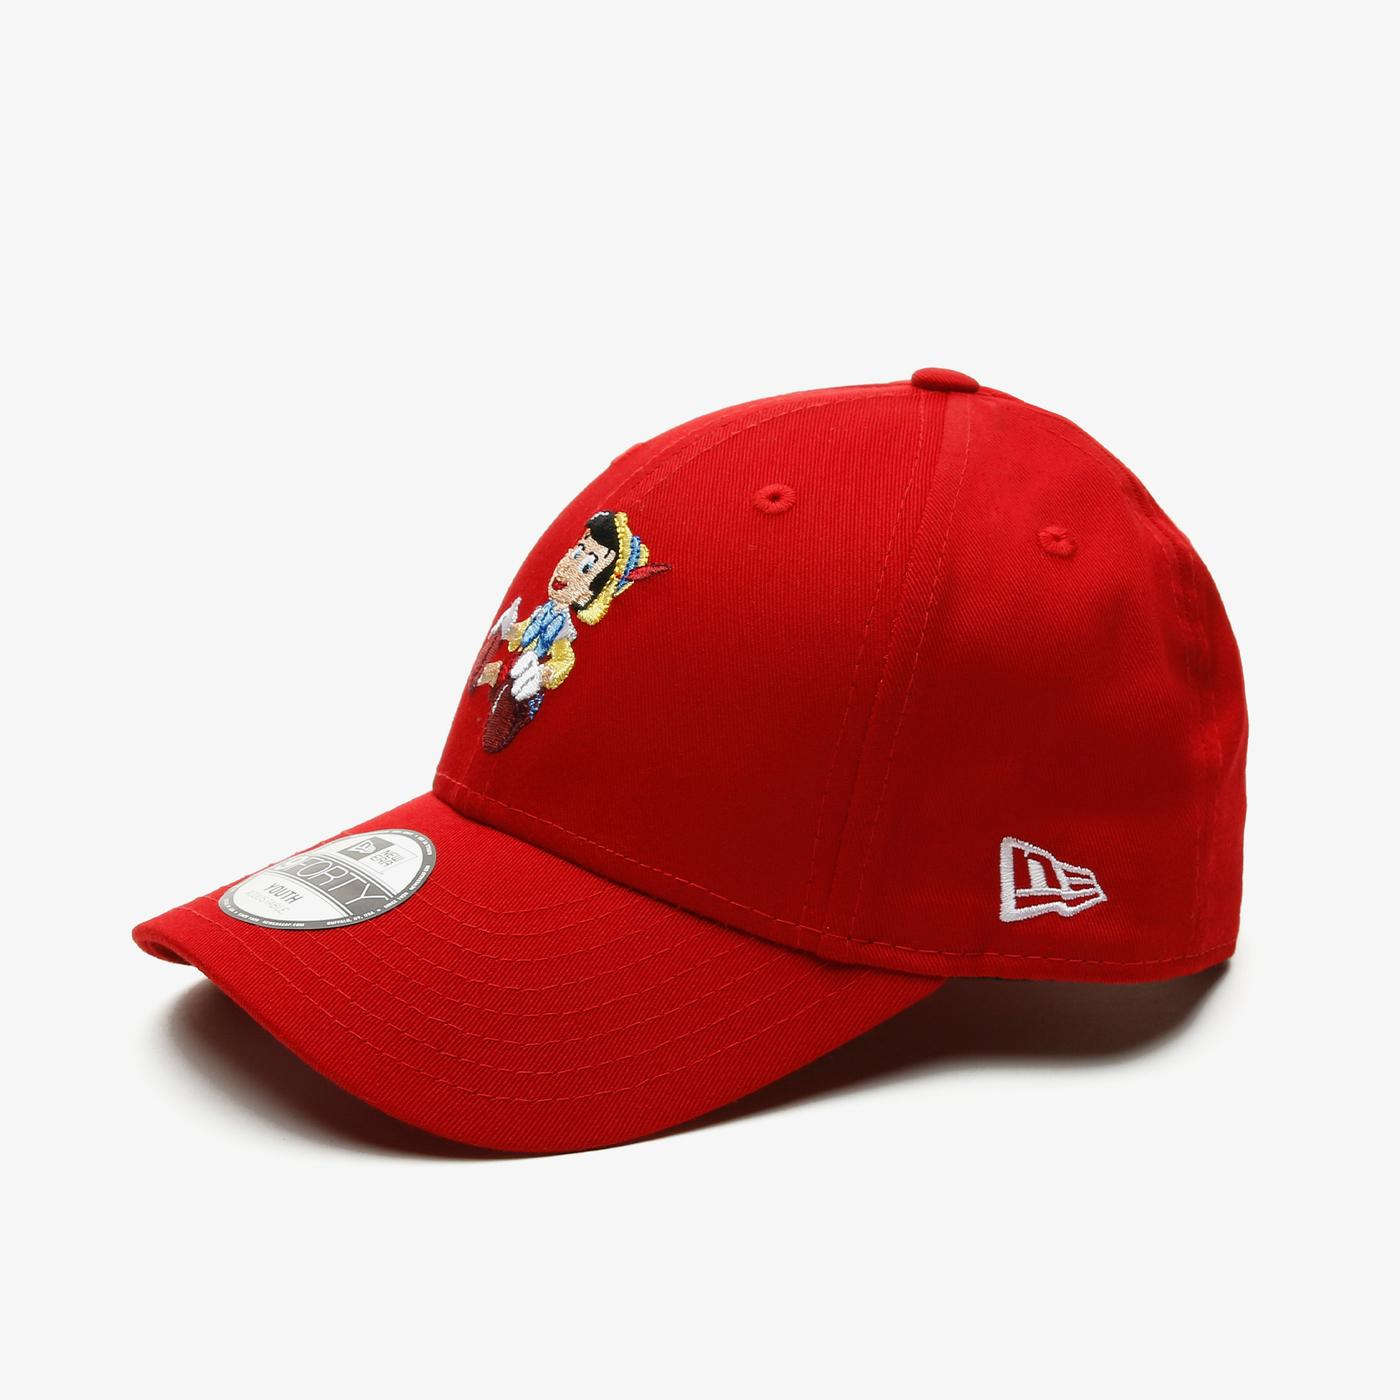 New Era CY Film Character 9Forty Pinocchio Çocuk Kırmızı Şapka